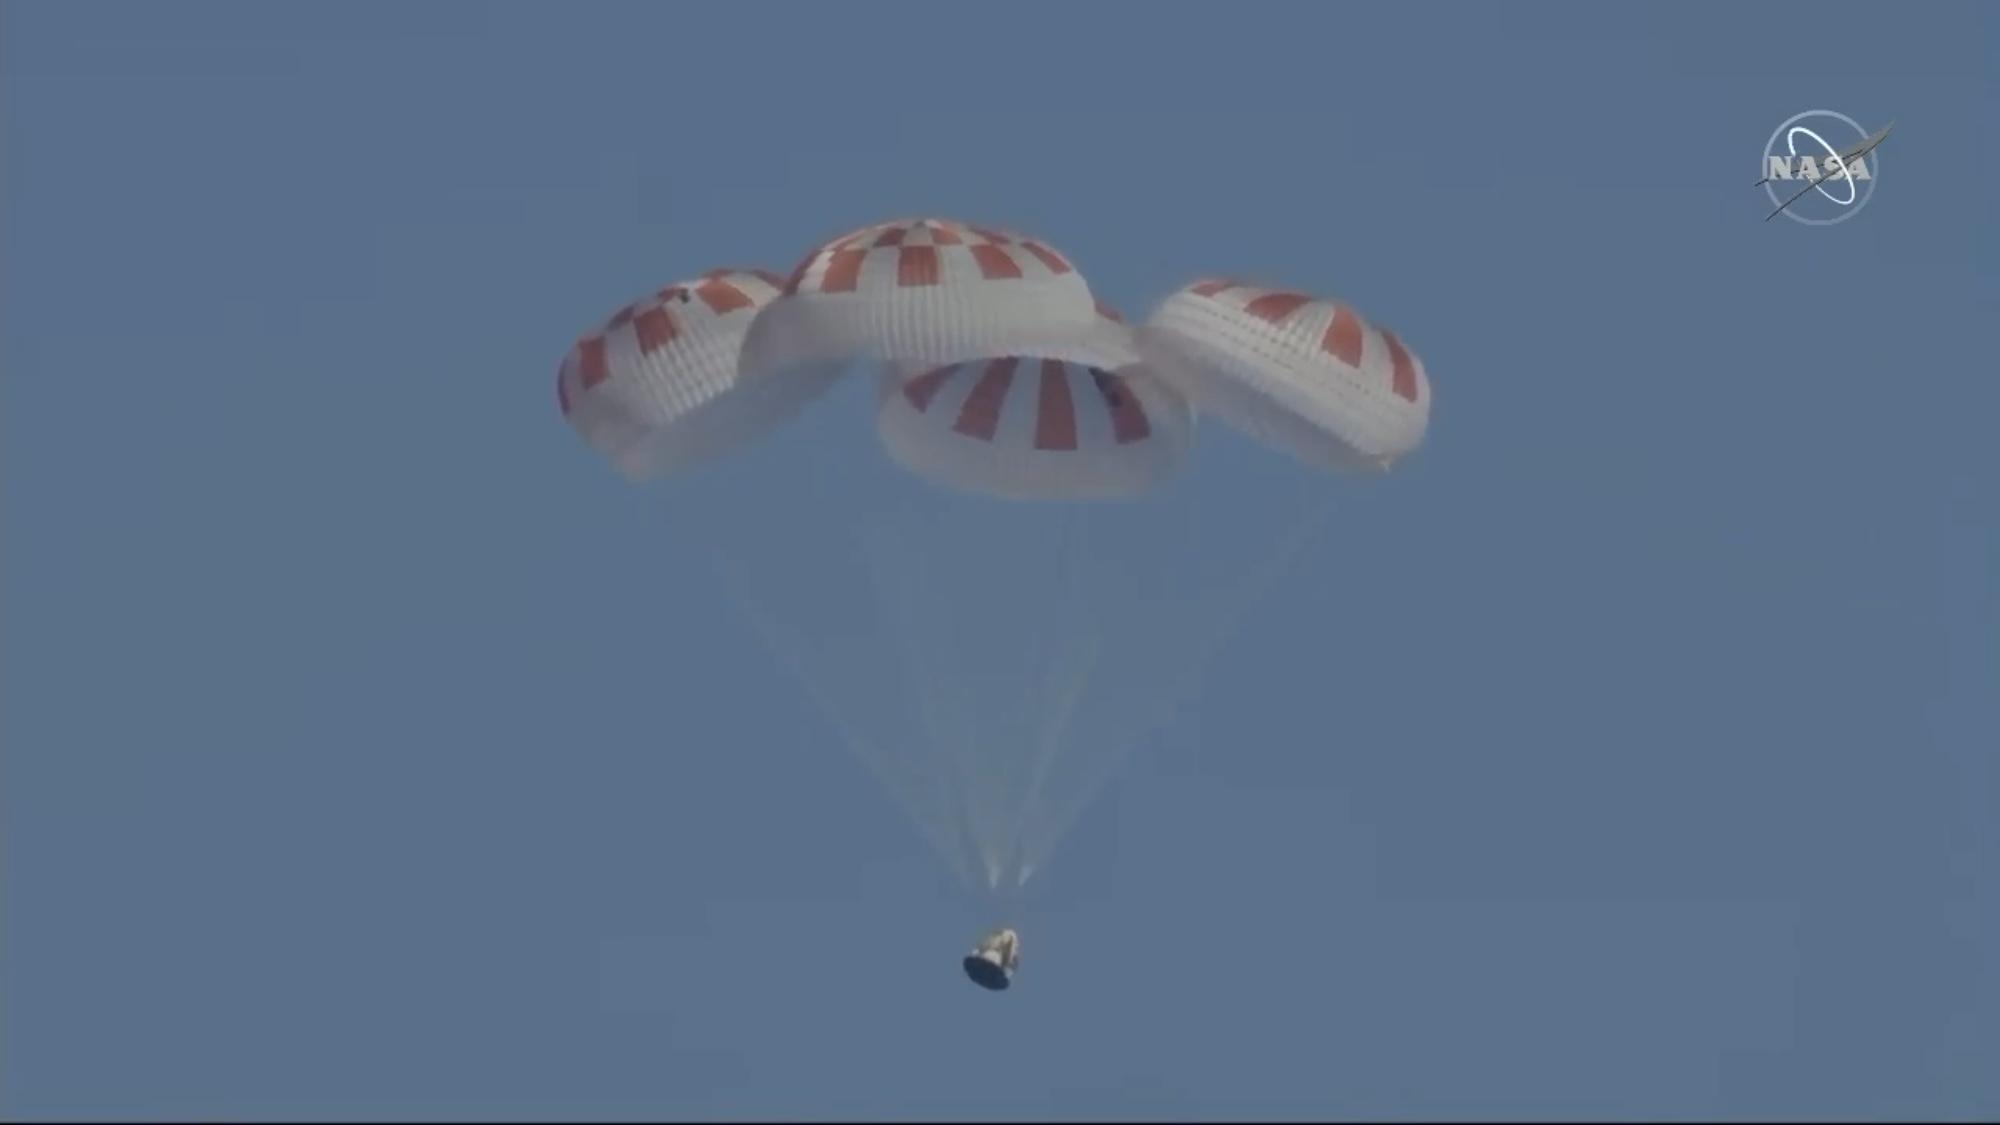 SpaceX Crew Dragon splash down brings NASA Astronauts closer to